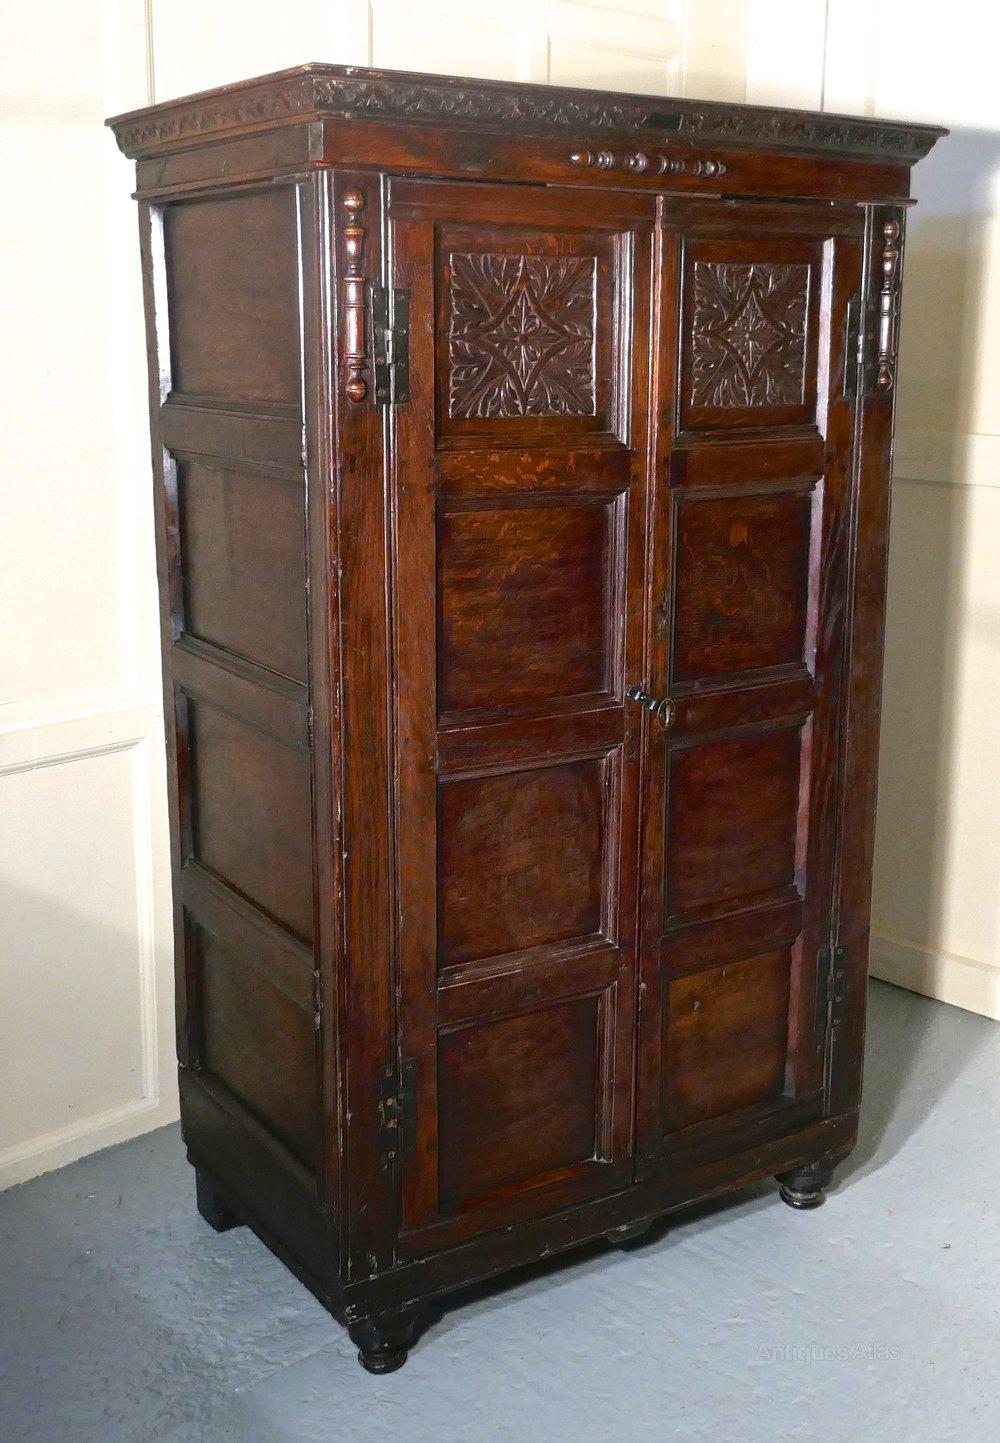 f id cylinder wardrobes at z victorian edwards wardrobe by case and antique pieces furniture desks for storage sale roberts bureau